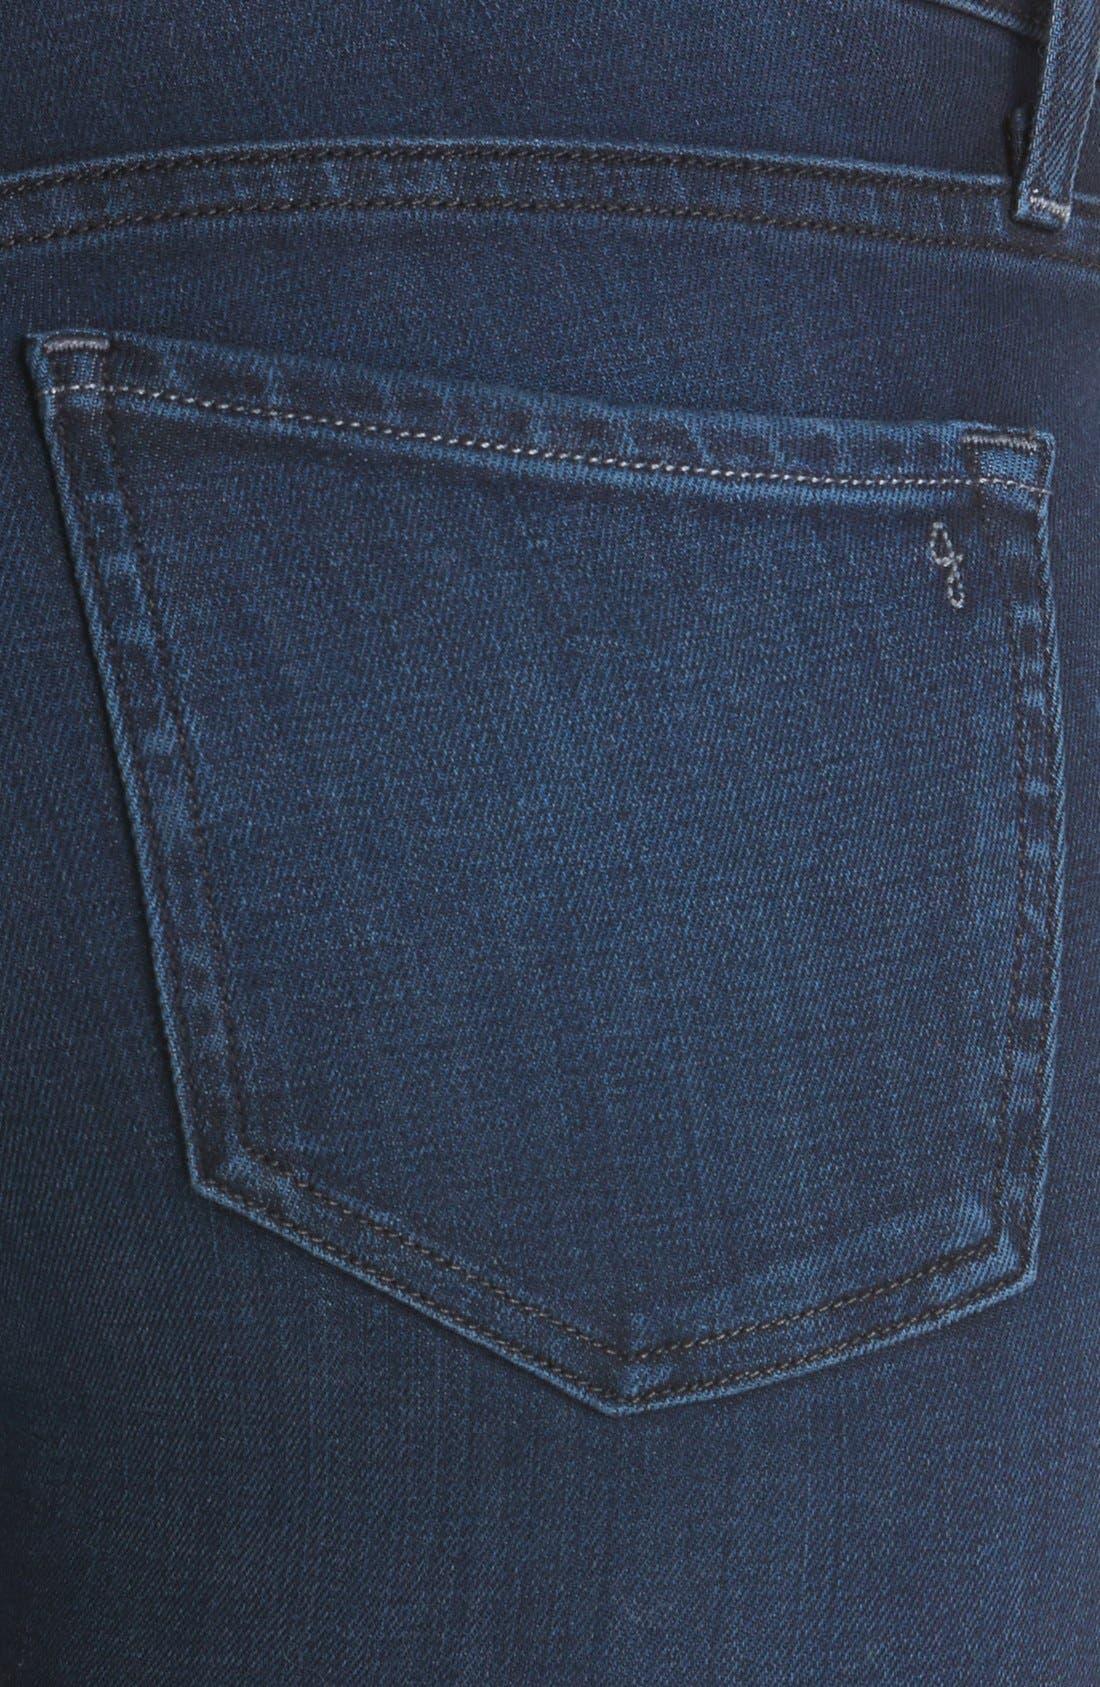 Alternate Image 3  - Joie Ankle Stretch Skinny Jeans (Neptune)